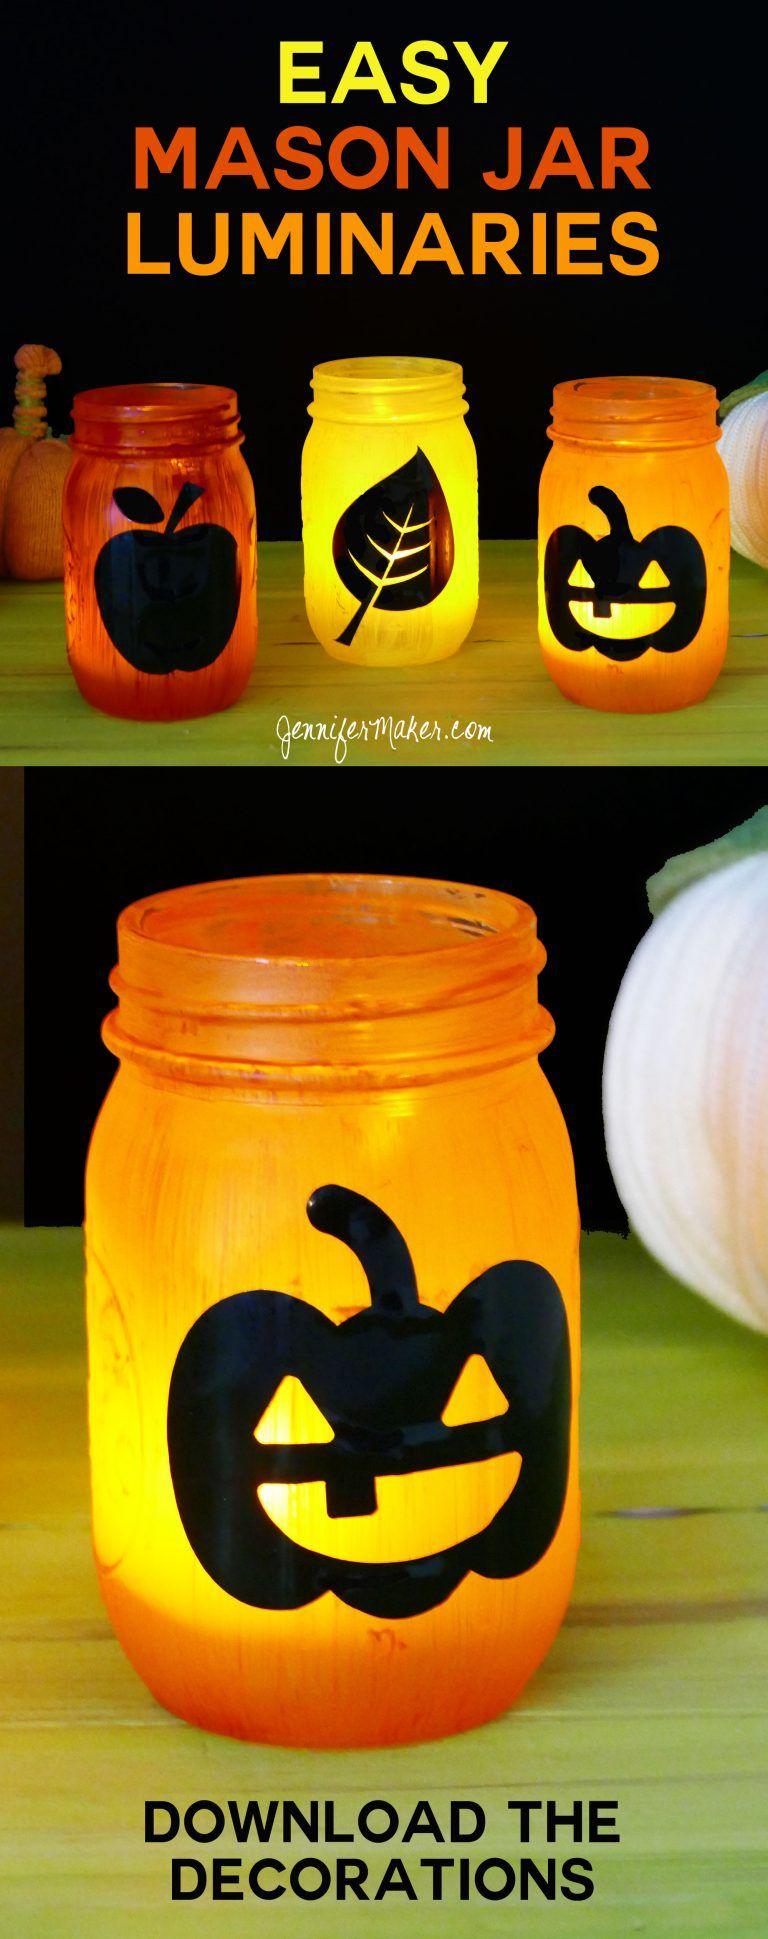 60 Easy Halloween Crafts for Adults Best DIY Halloween